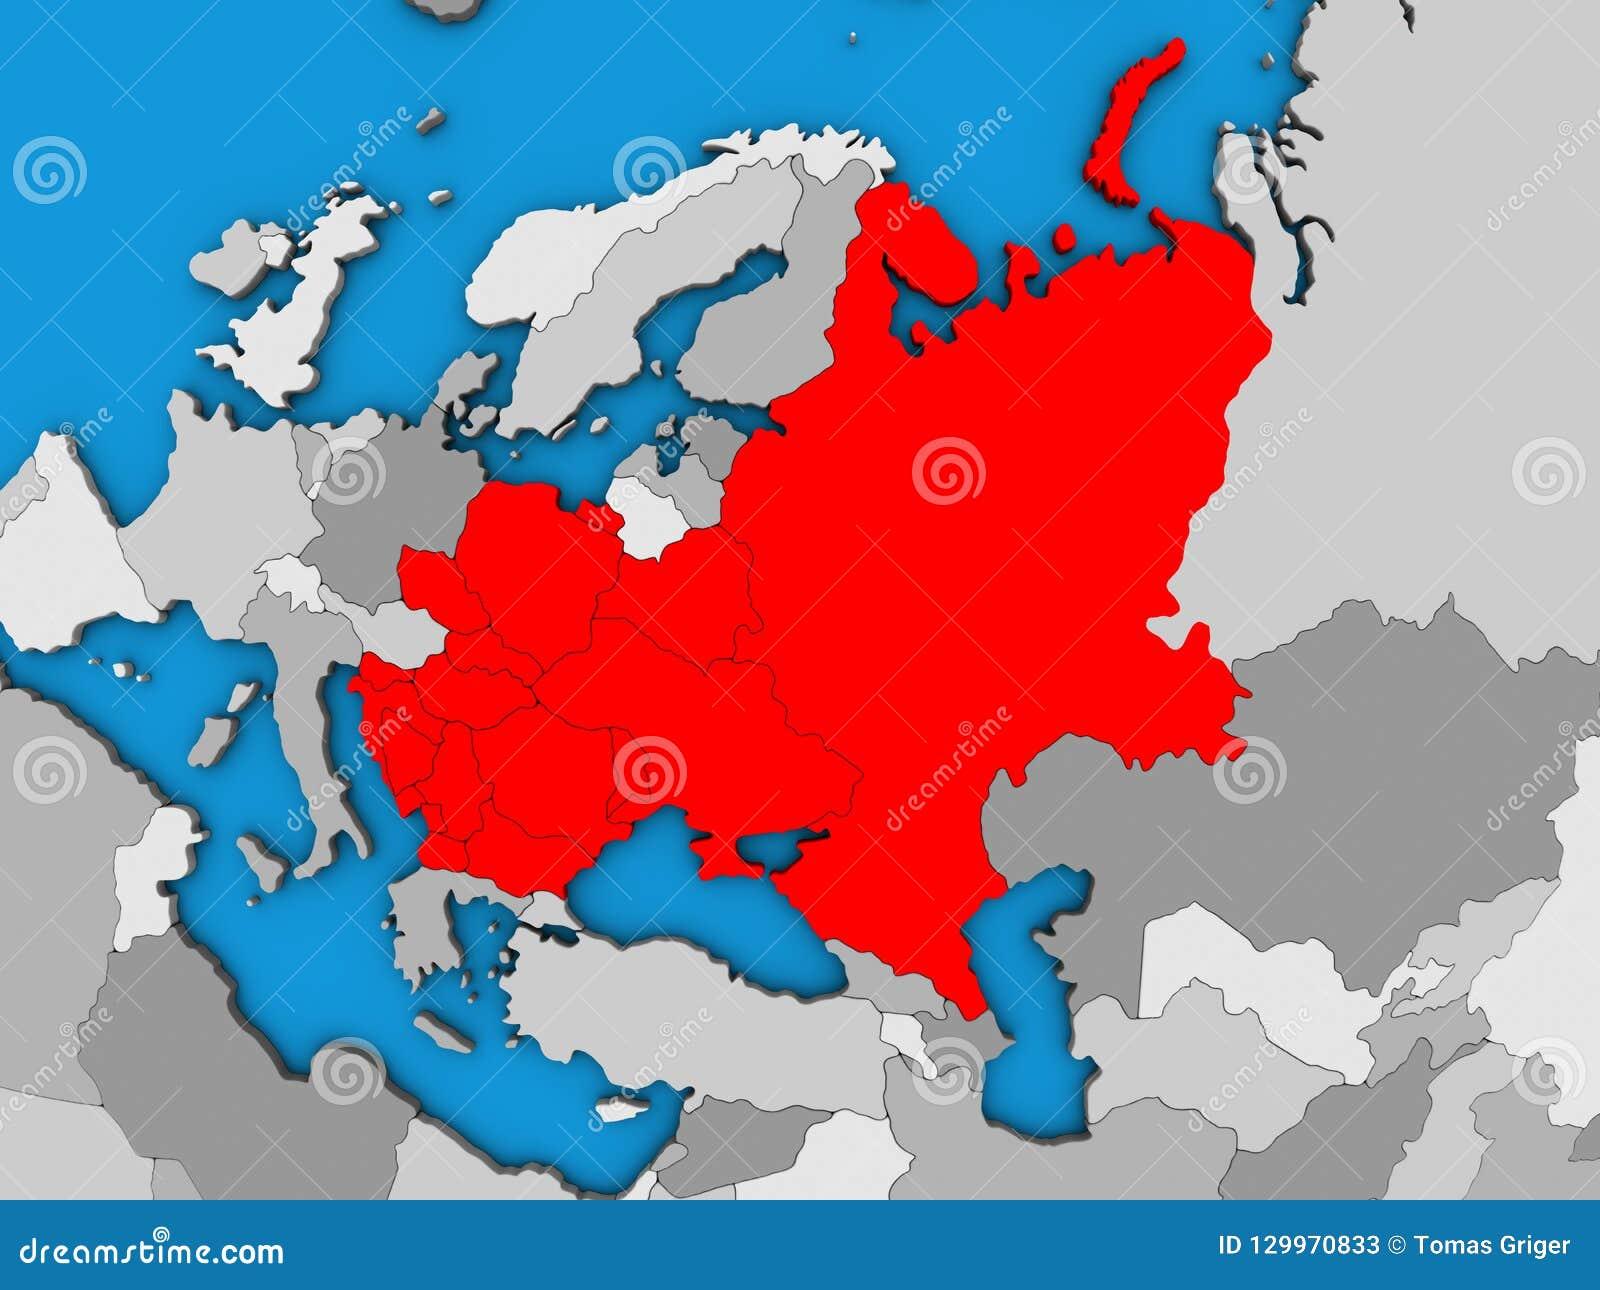 Political Map Eastern Europe.Eastern Europe On 3d Map Stock Illustration Illustration Of Europe